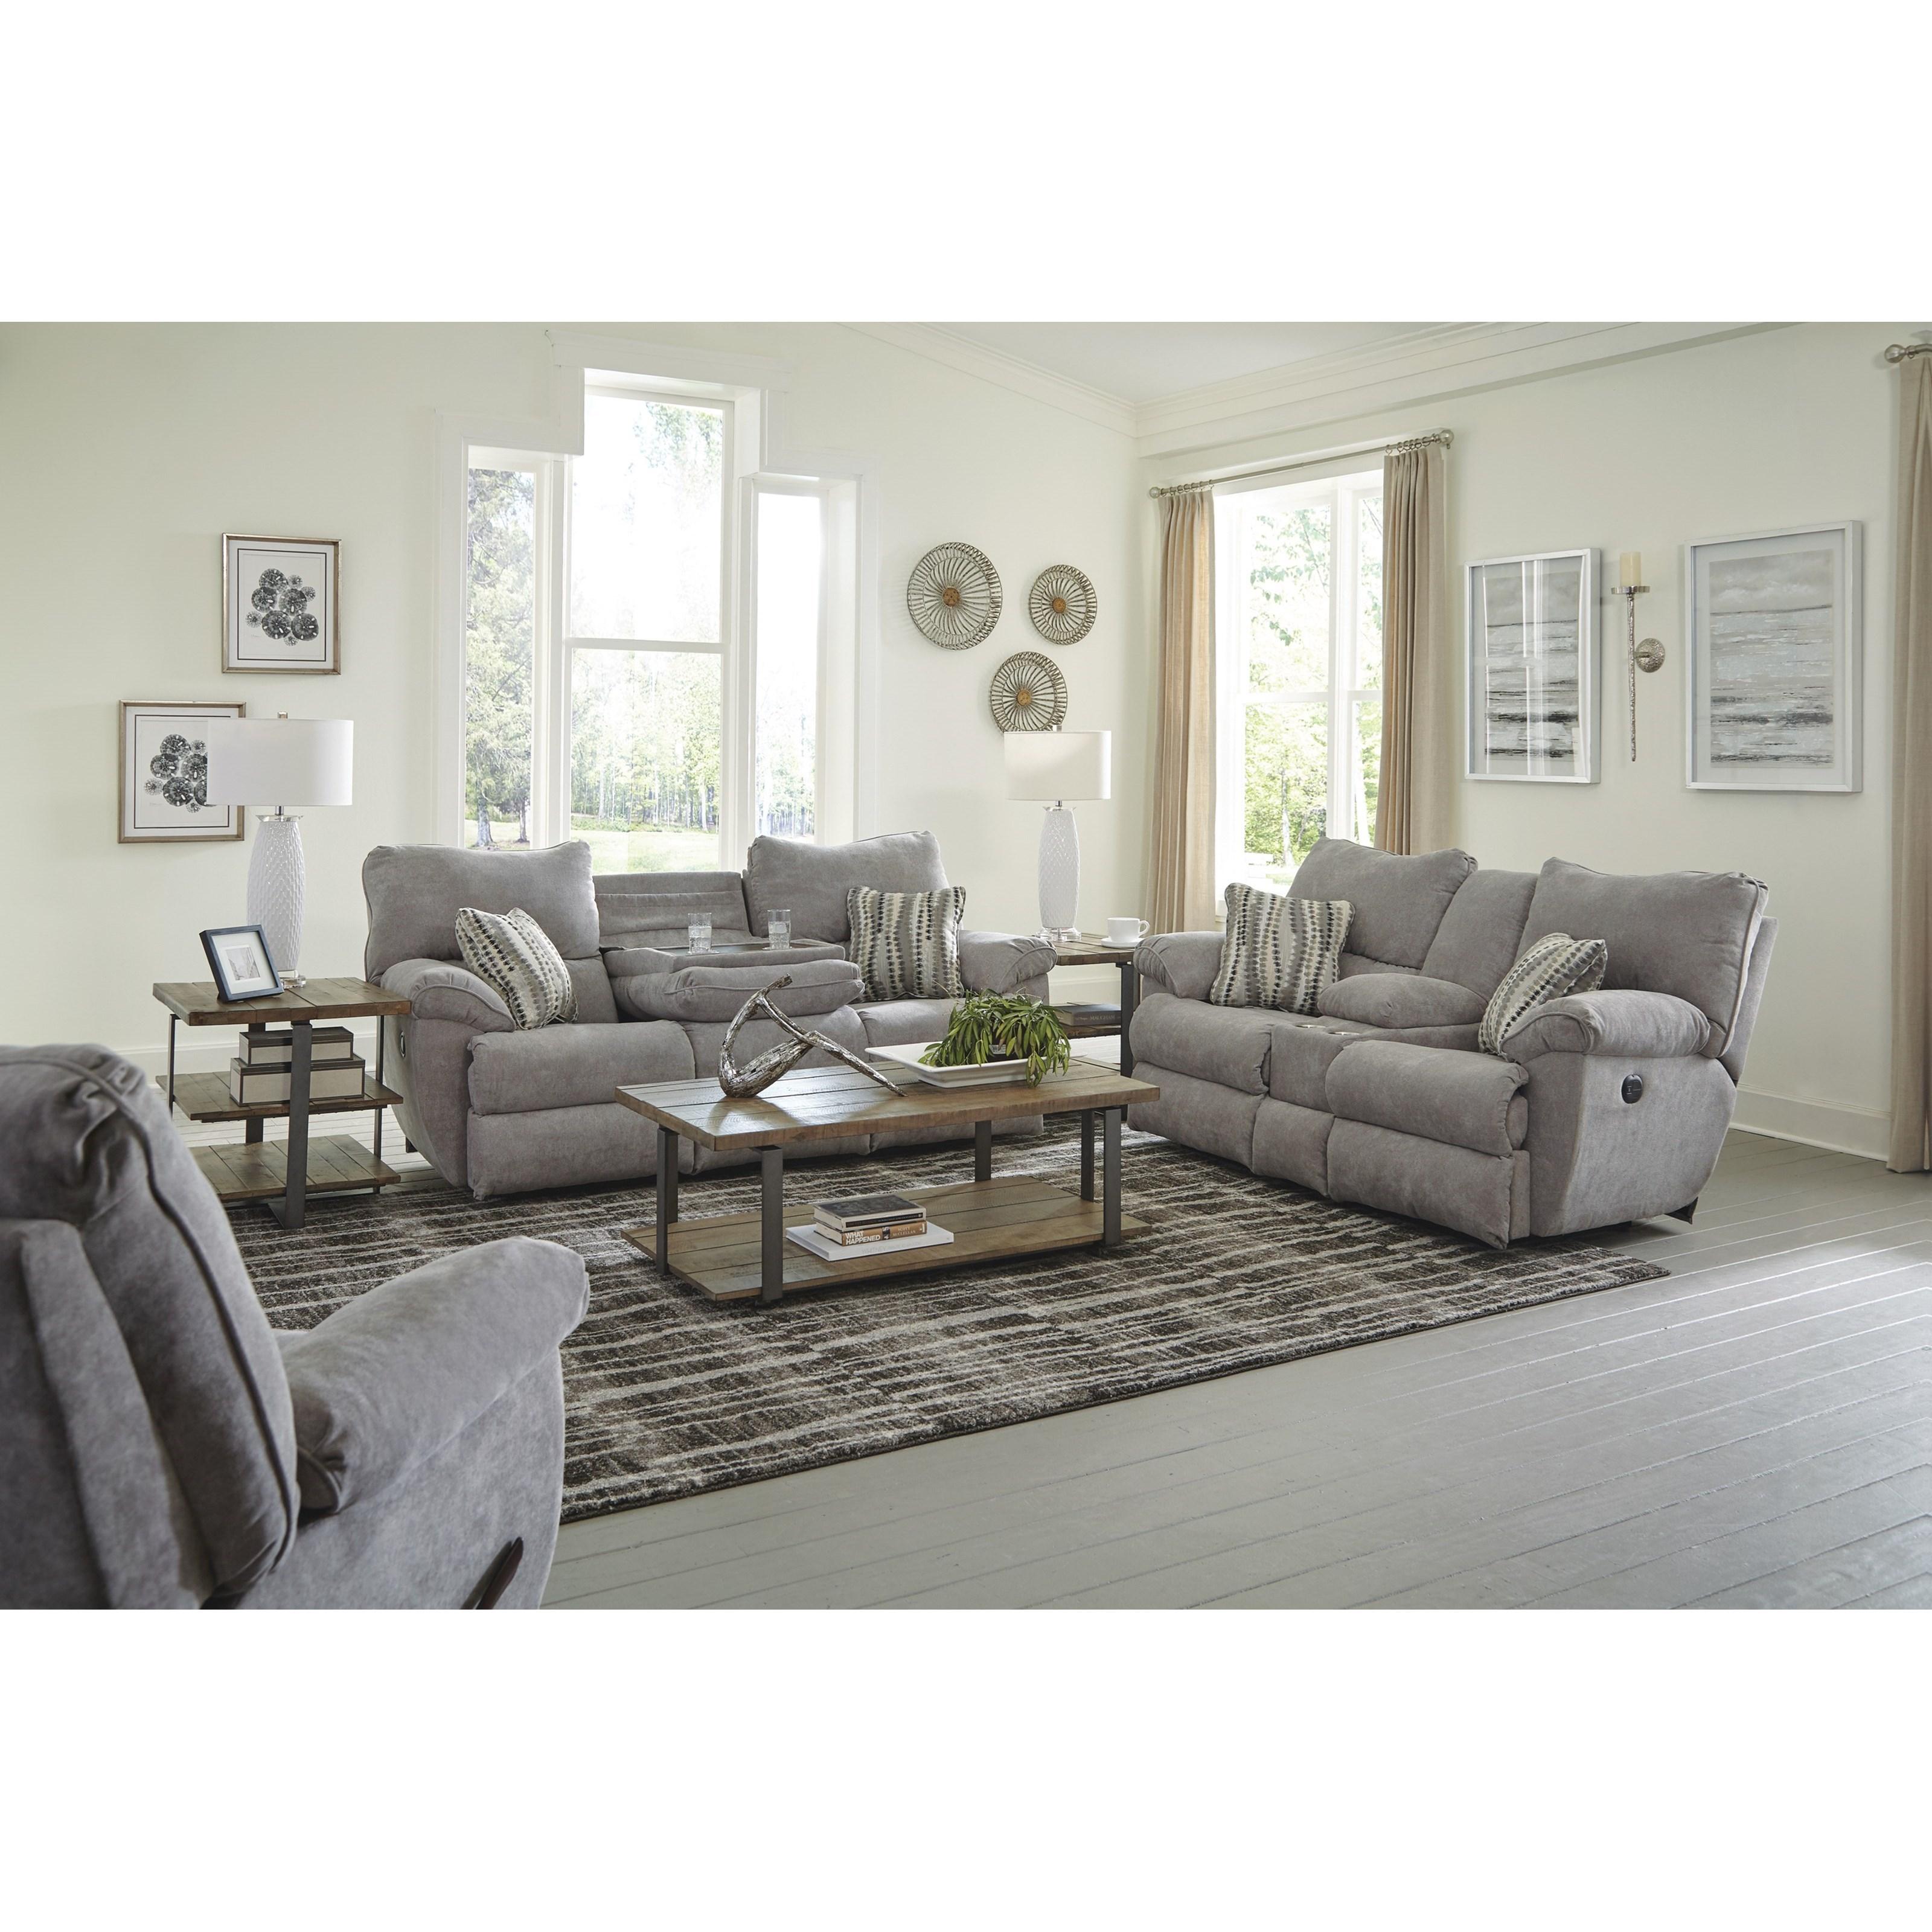 Sadler Reclining Living Room Group by Catnapper at Standard Furniture